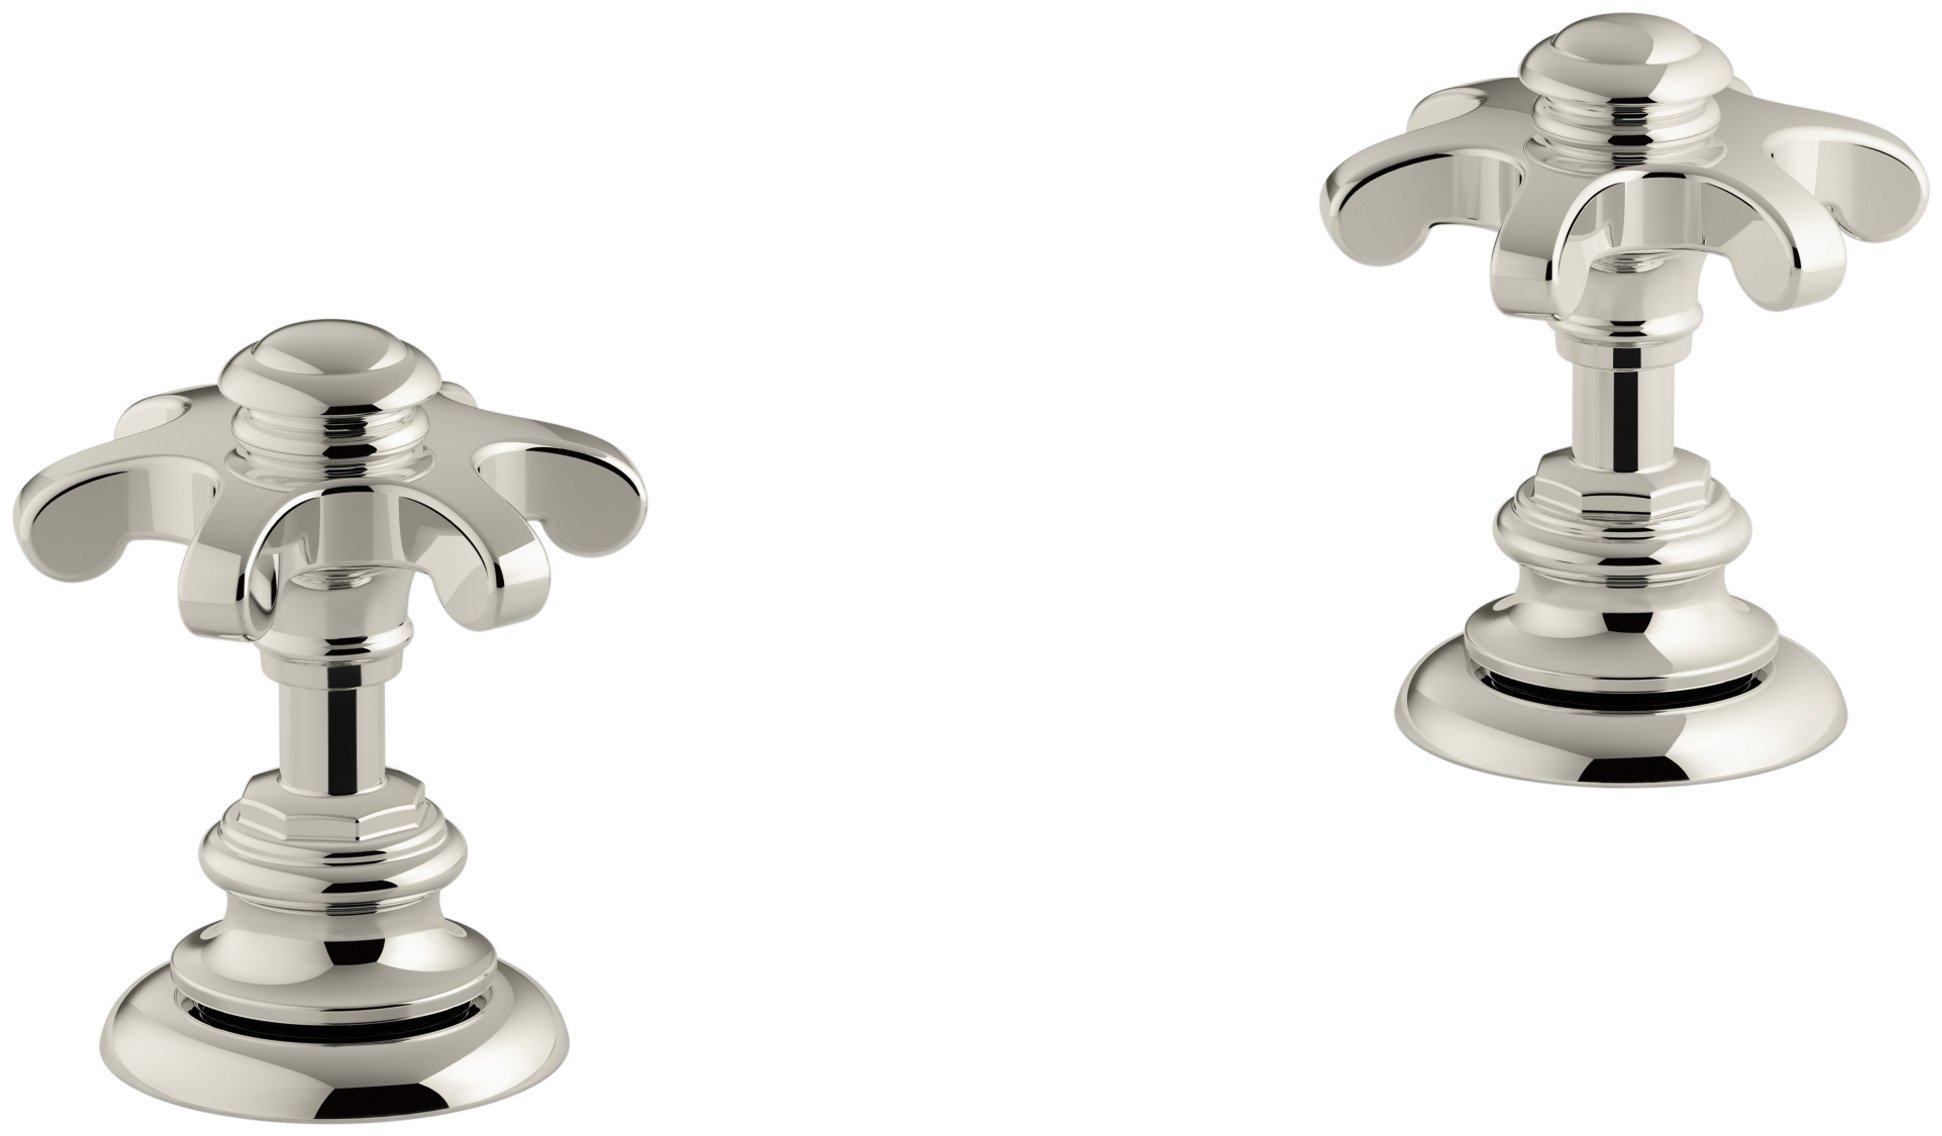 KOHLER K-98068-3M-SN Artifacts Bathroom sink prong handles, Less Spout, Vibrant Polished Nickel